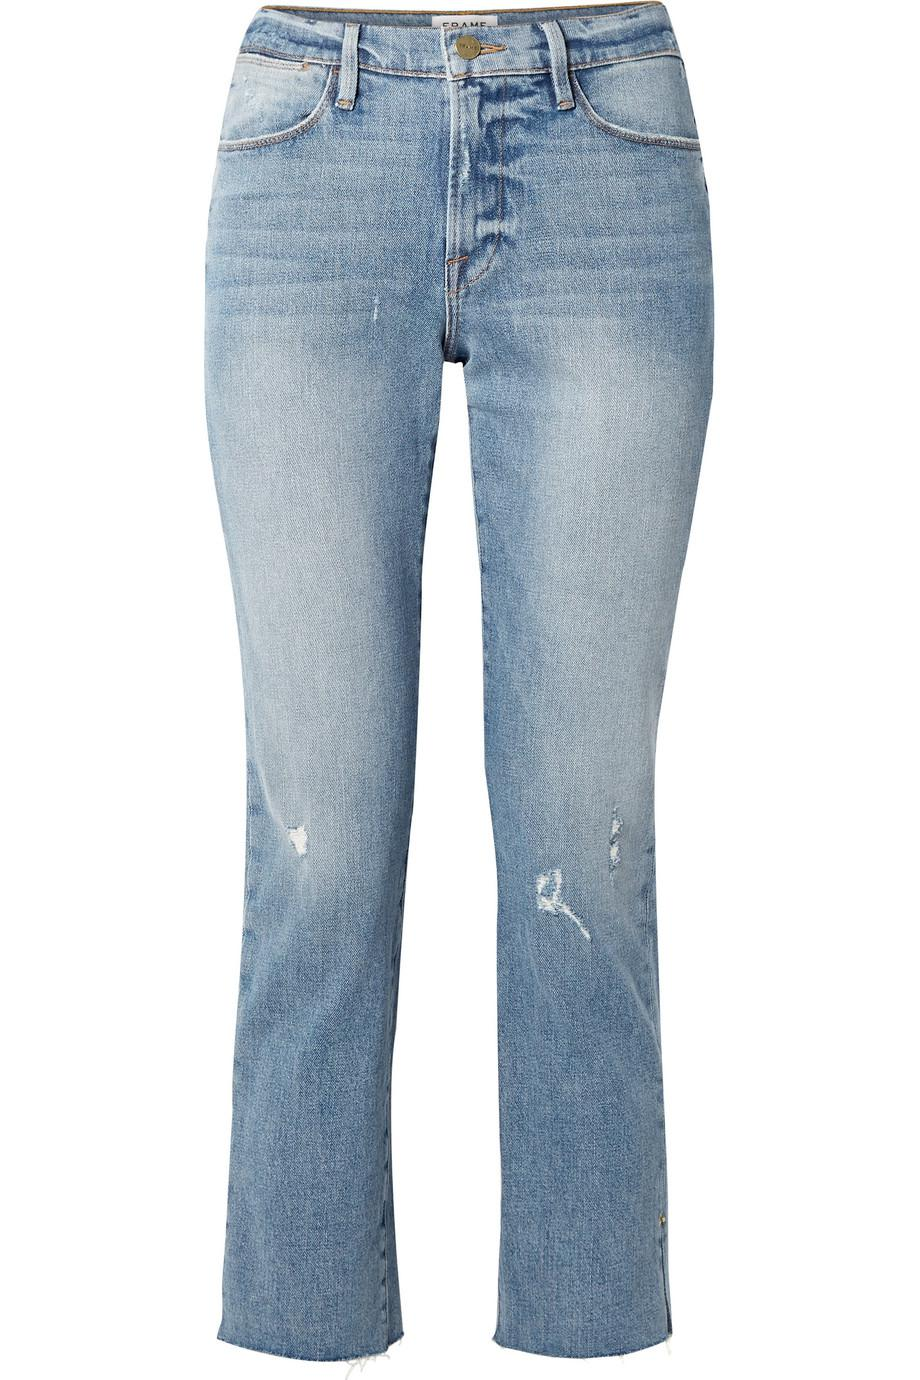 Get Authentic Sale Online Big Discount Le High Distressed Cropped Straight-leg Jeans - Mid denim Frame Denim V2Fj9